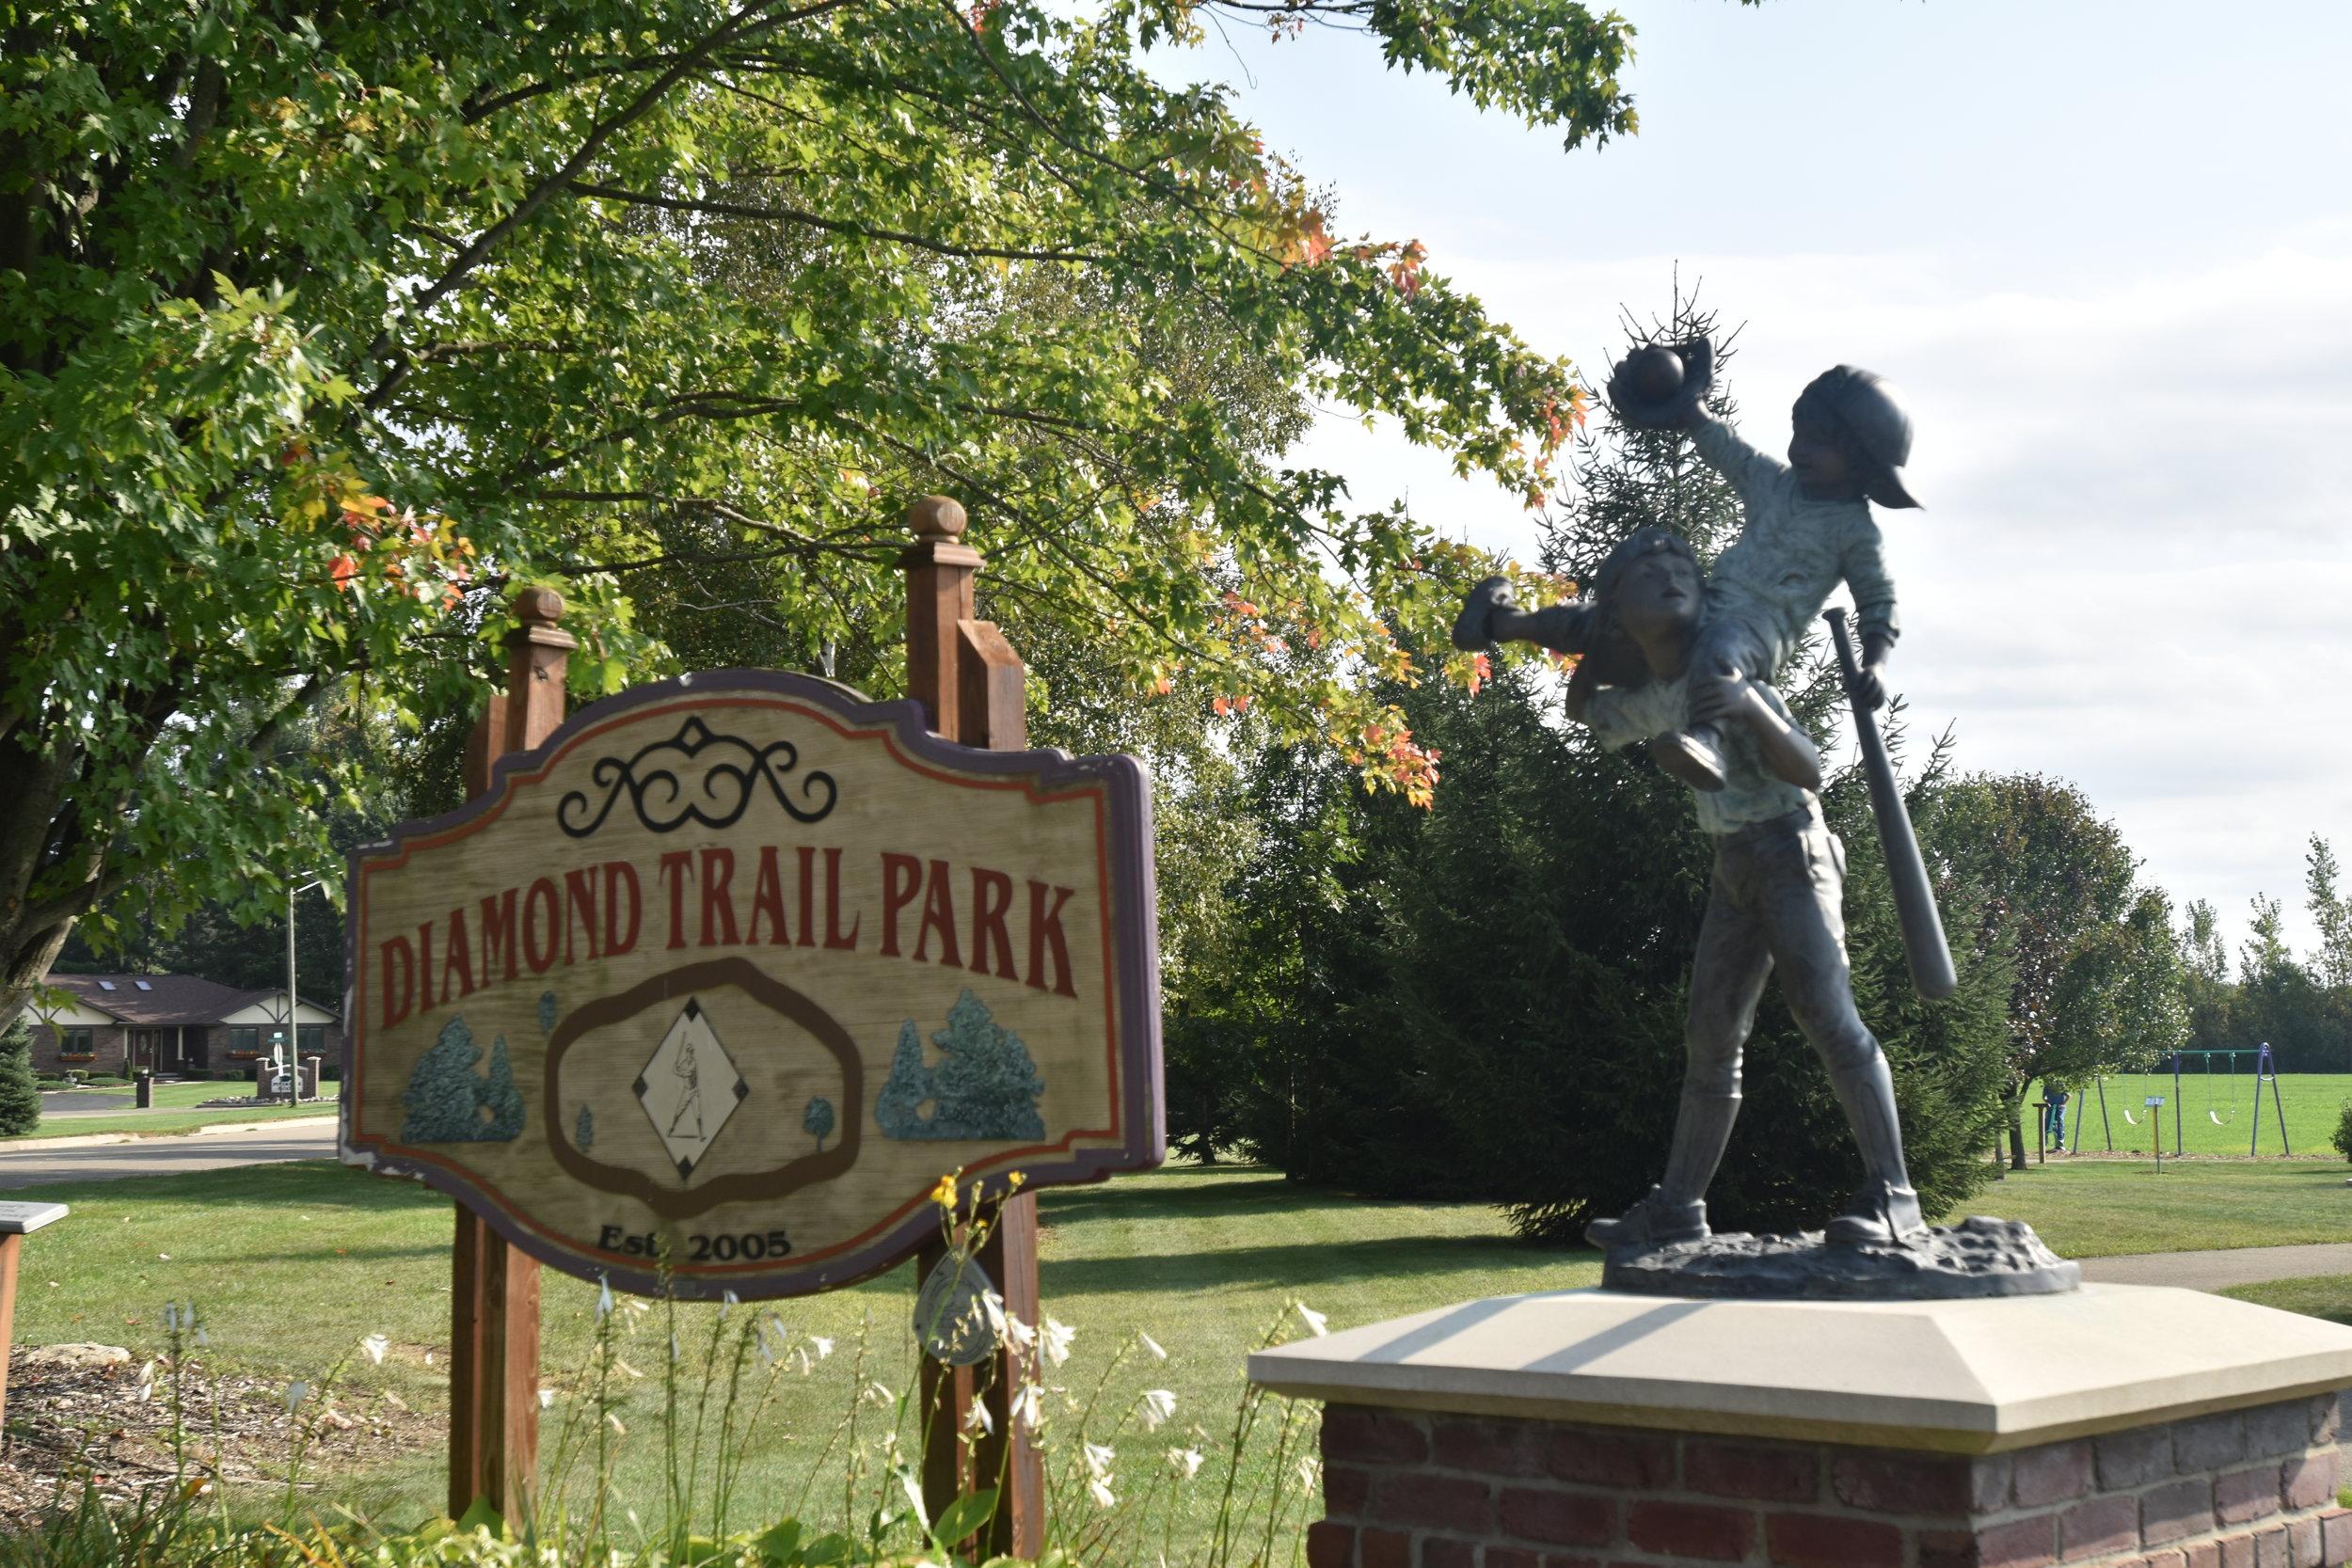 Diamond Trail Park